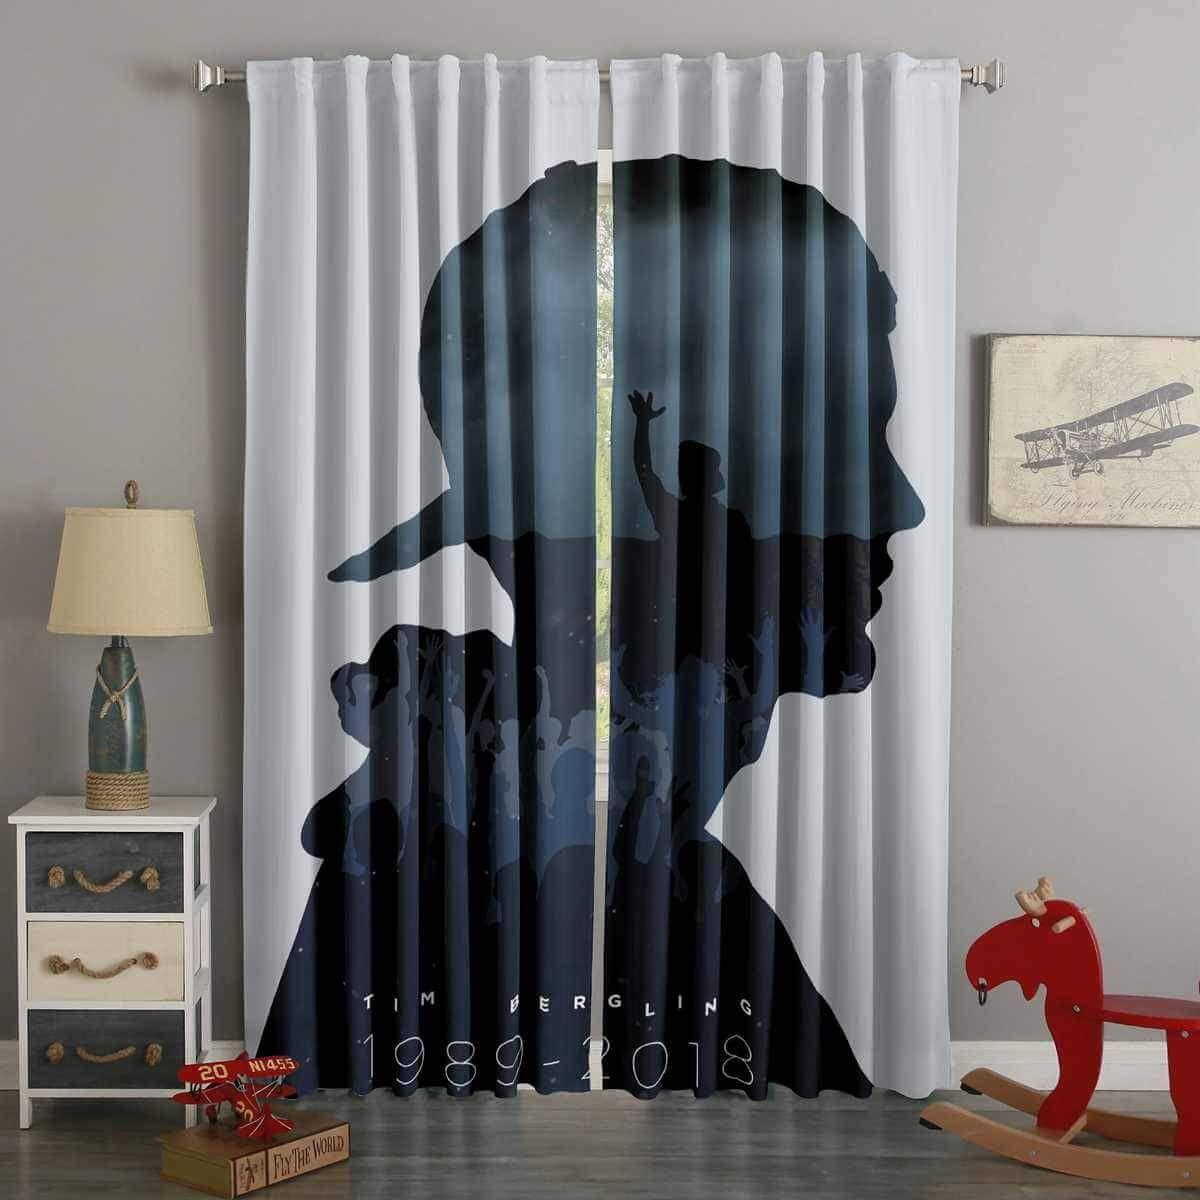 3d Printed Avicii Style Custom Living Room Curtains Westbedding Curtains Living Room Curtains Custom Curtains #printed #living #room #curtains